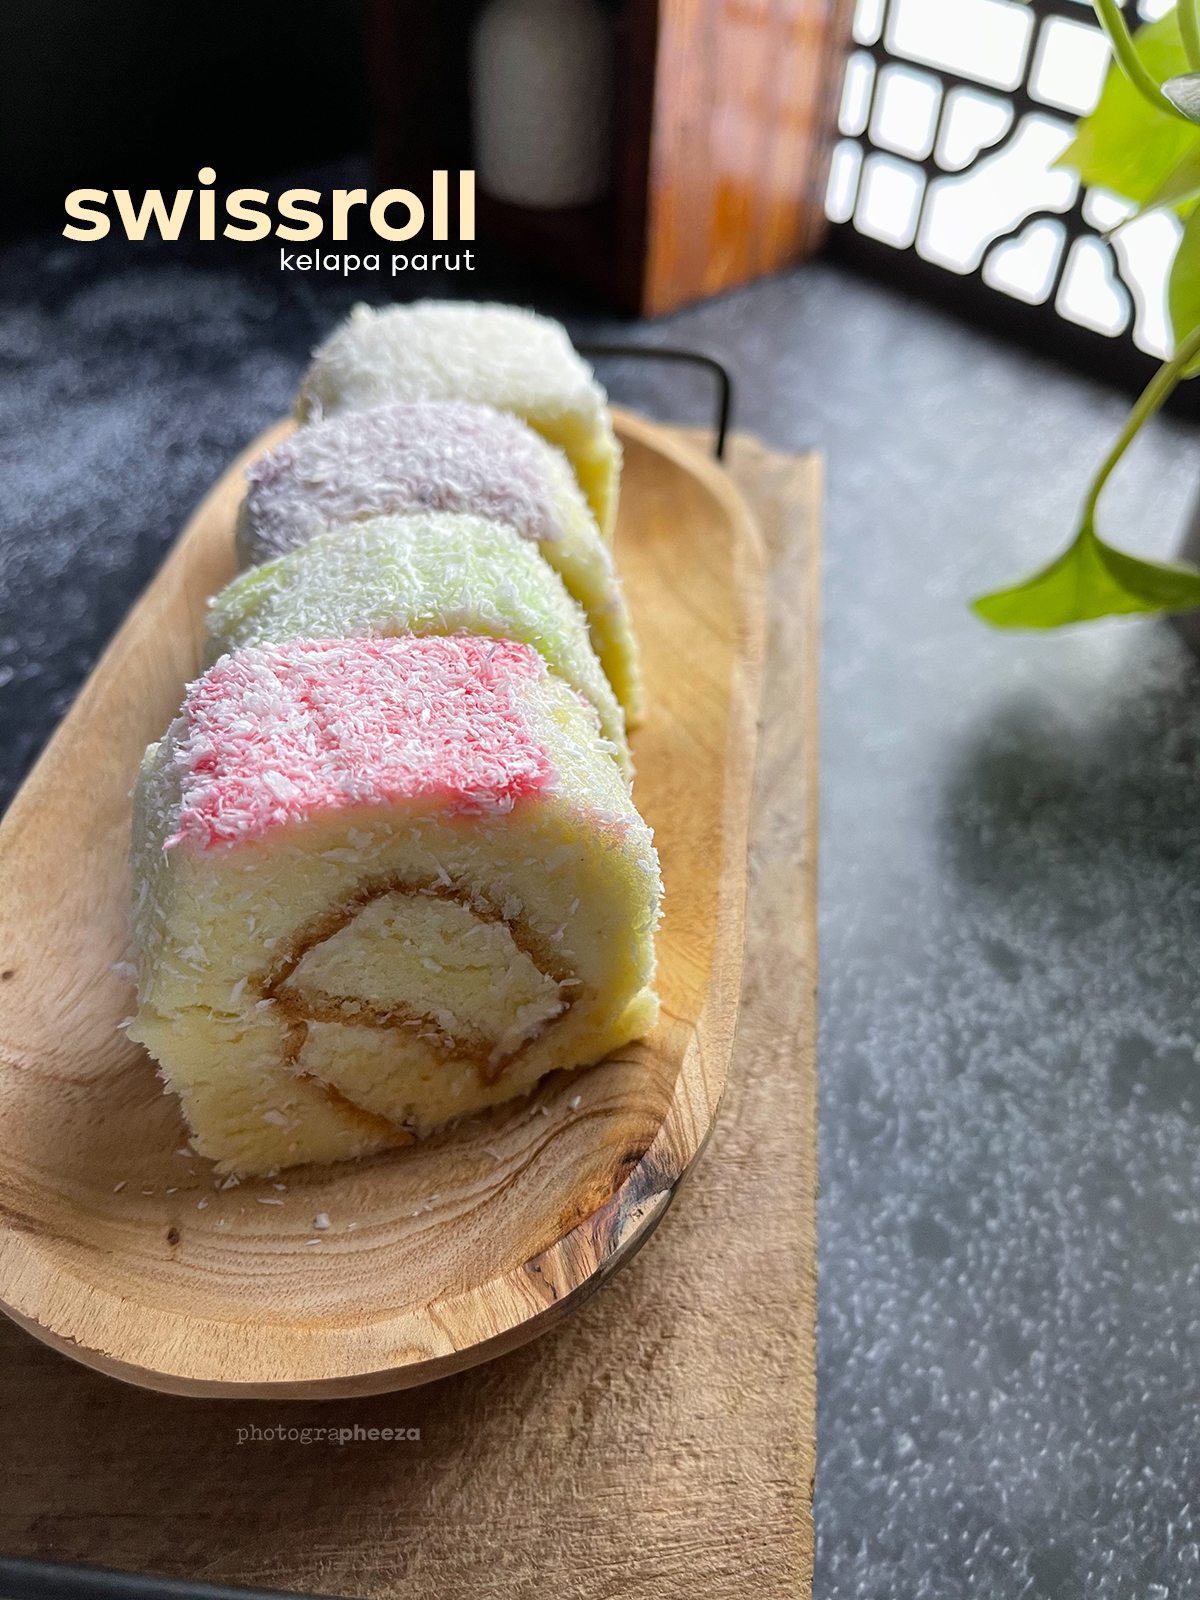 Swissroll Kelapa Parut